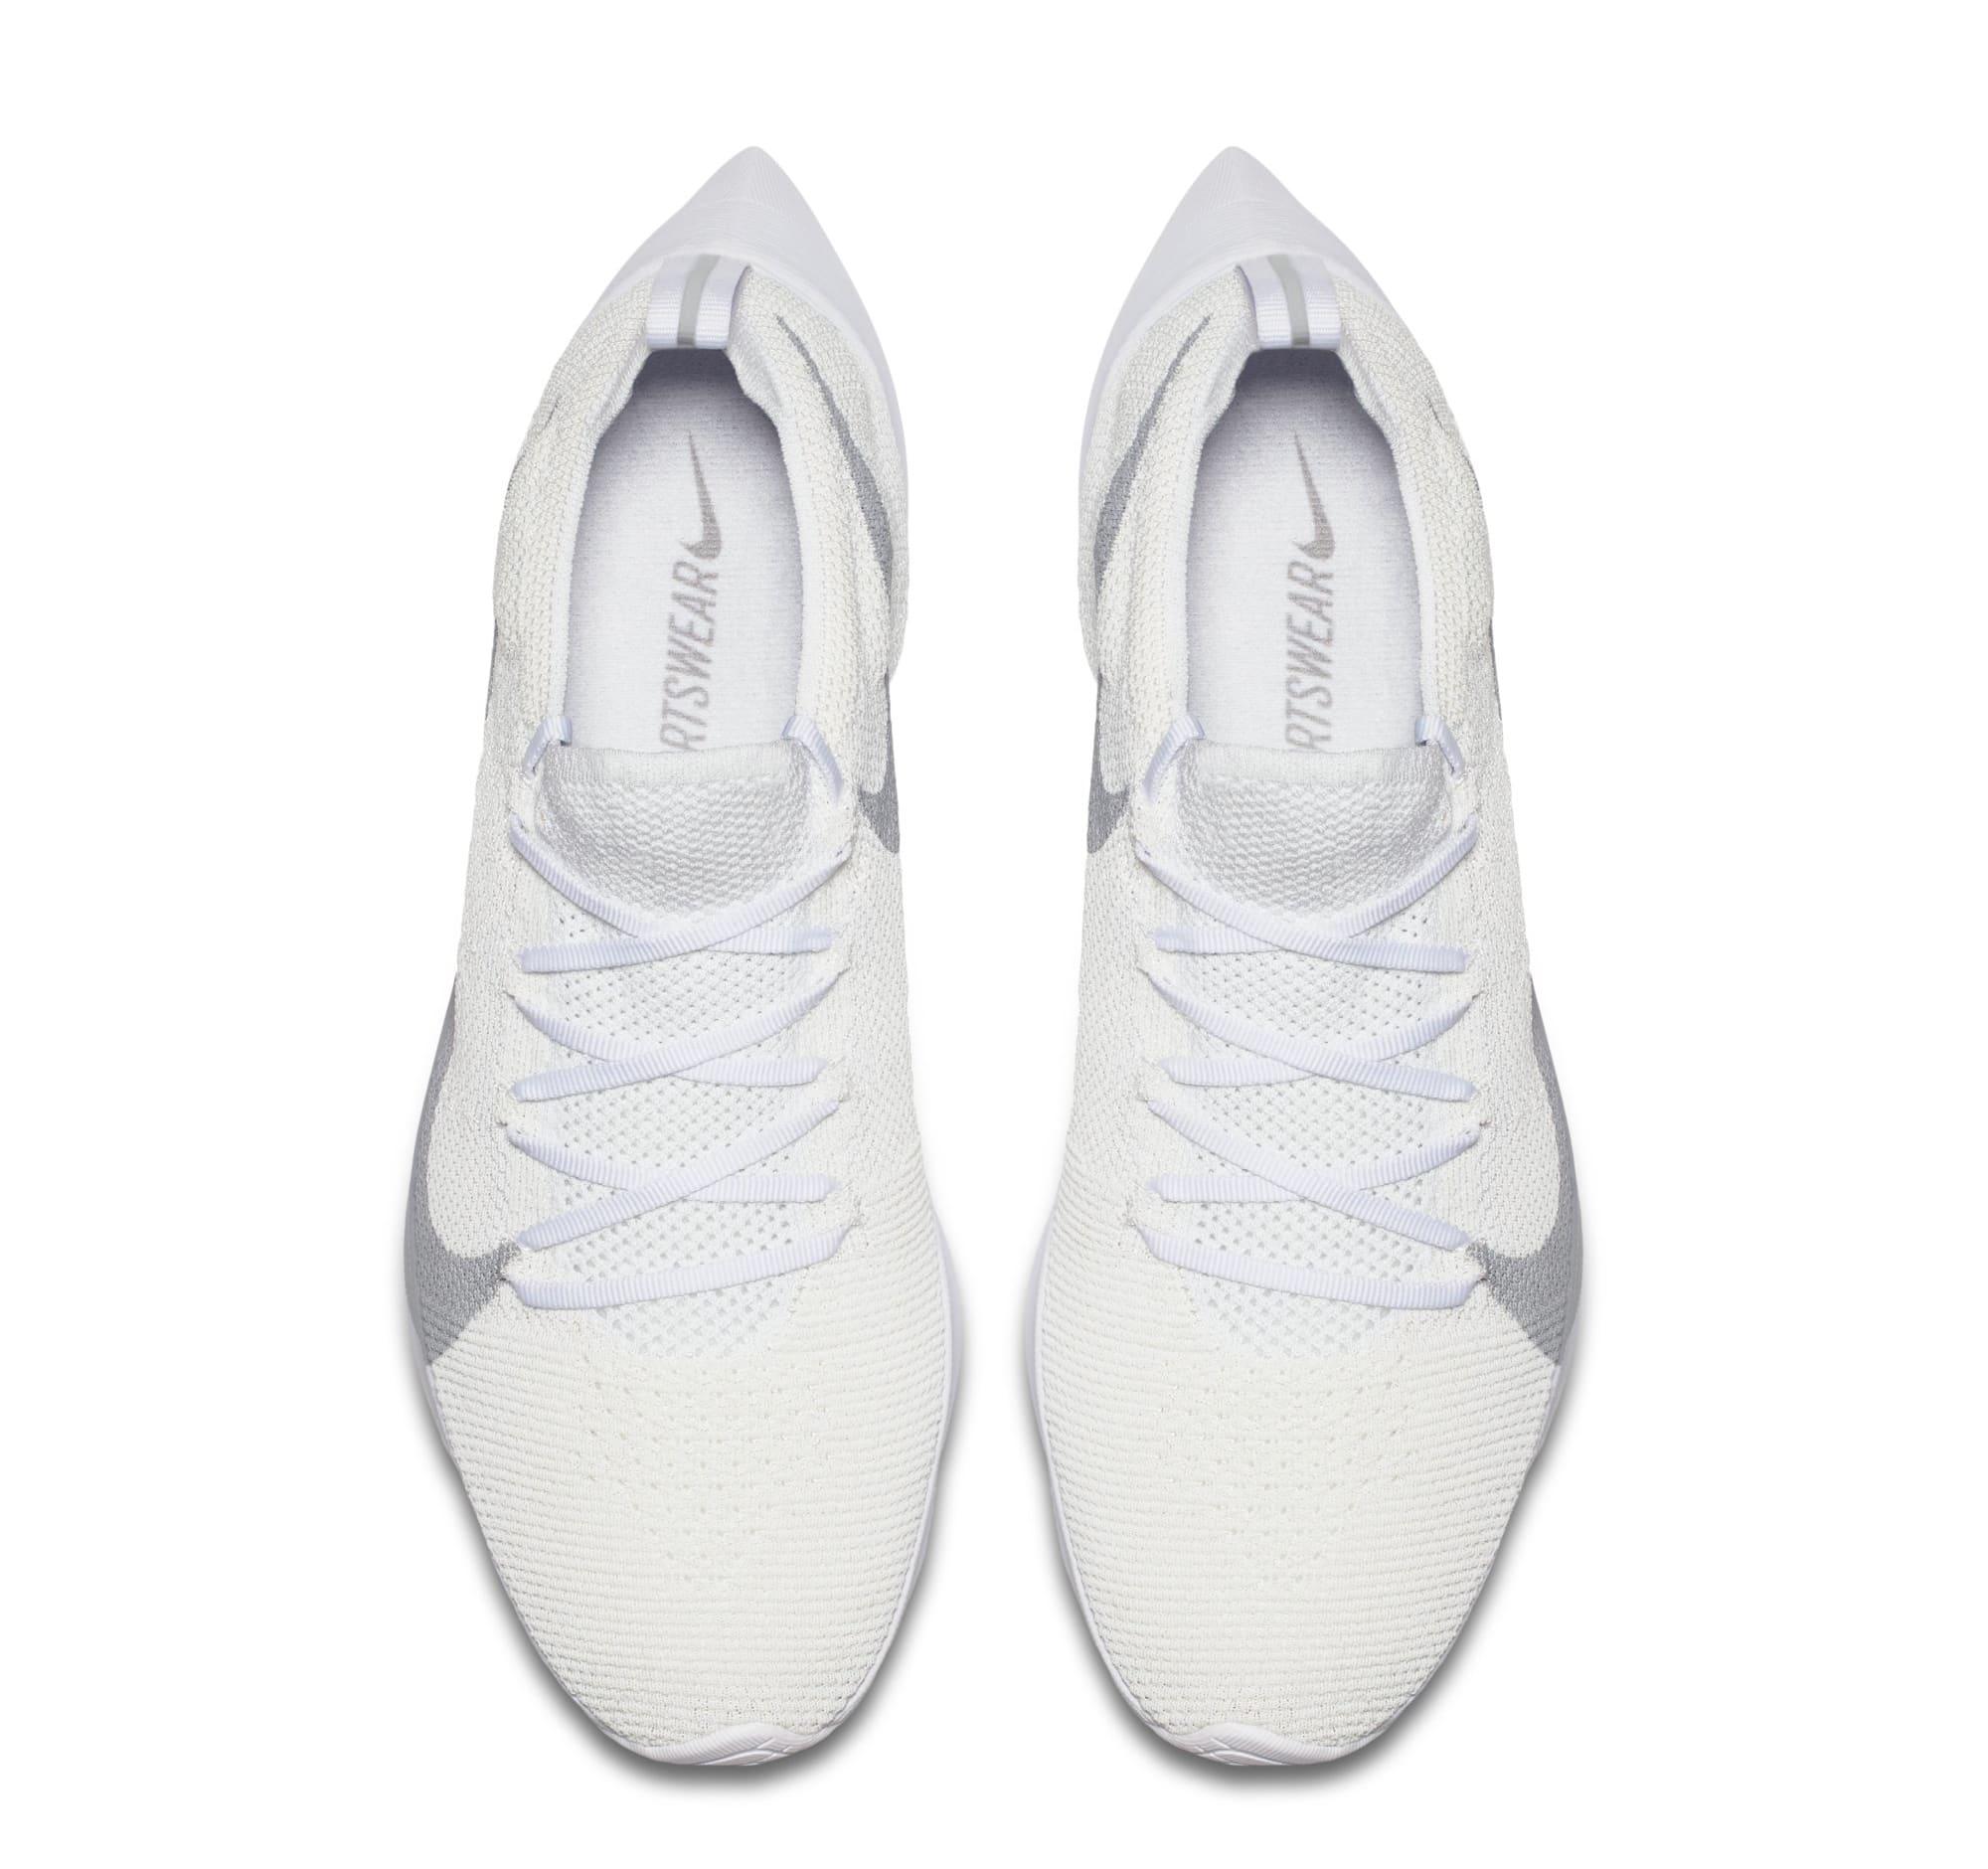 Nike Vapor Street Flyknit 'White/Wolf Grey' AQ1763-100 (Top)